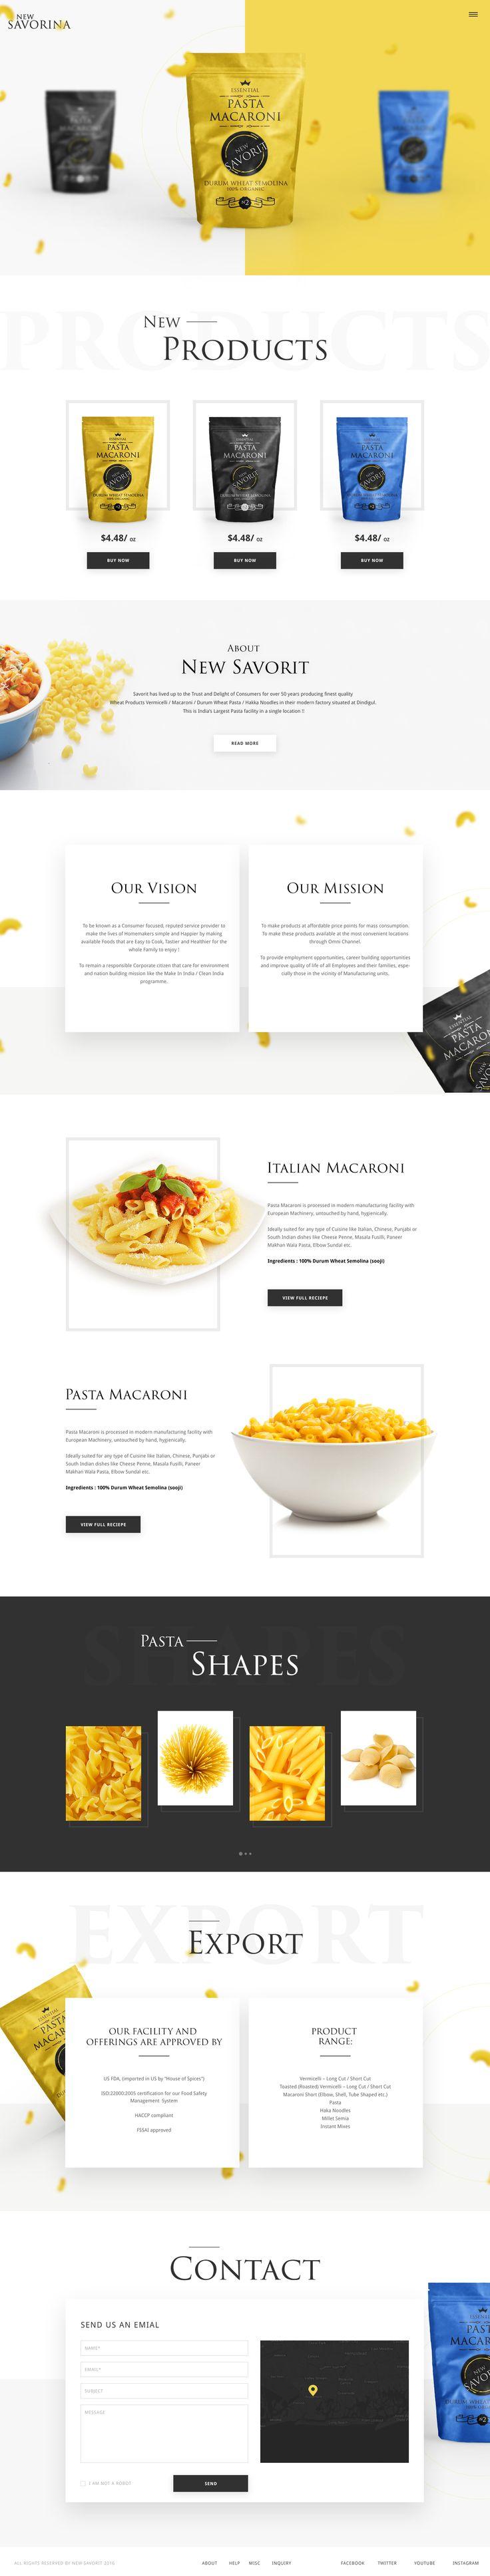 Home pasta 2